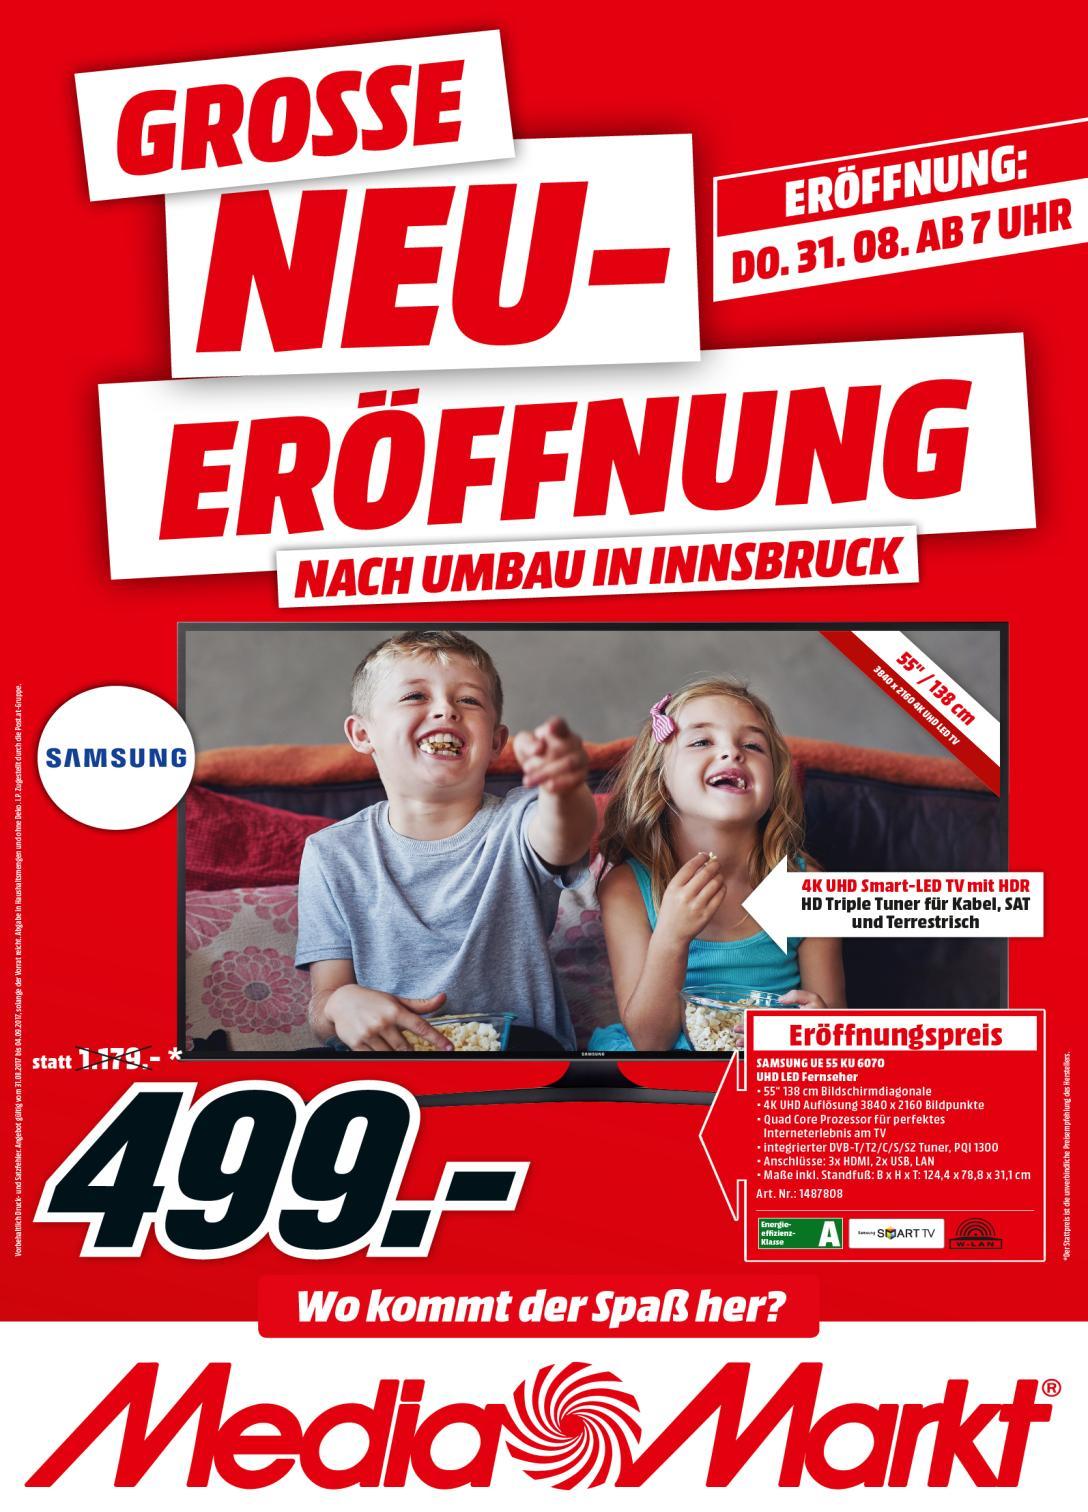 Neueröffnung Media Markt Innsbruck 31.08.2017